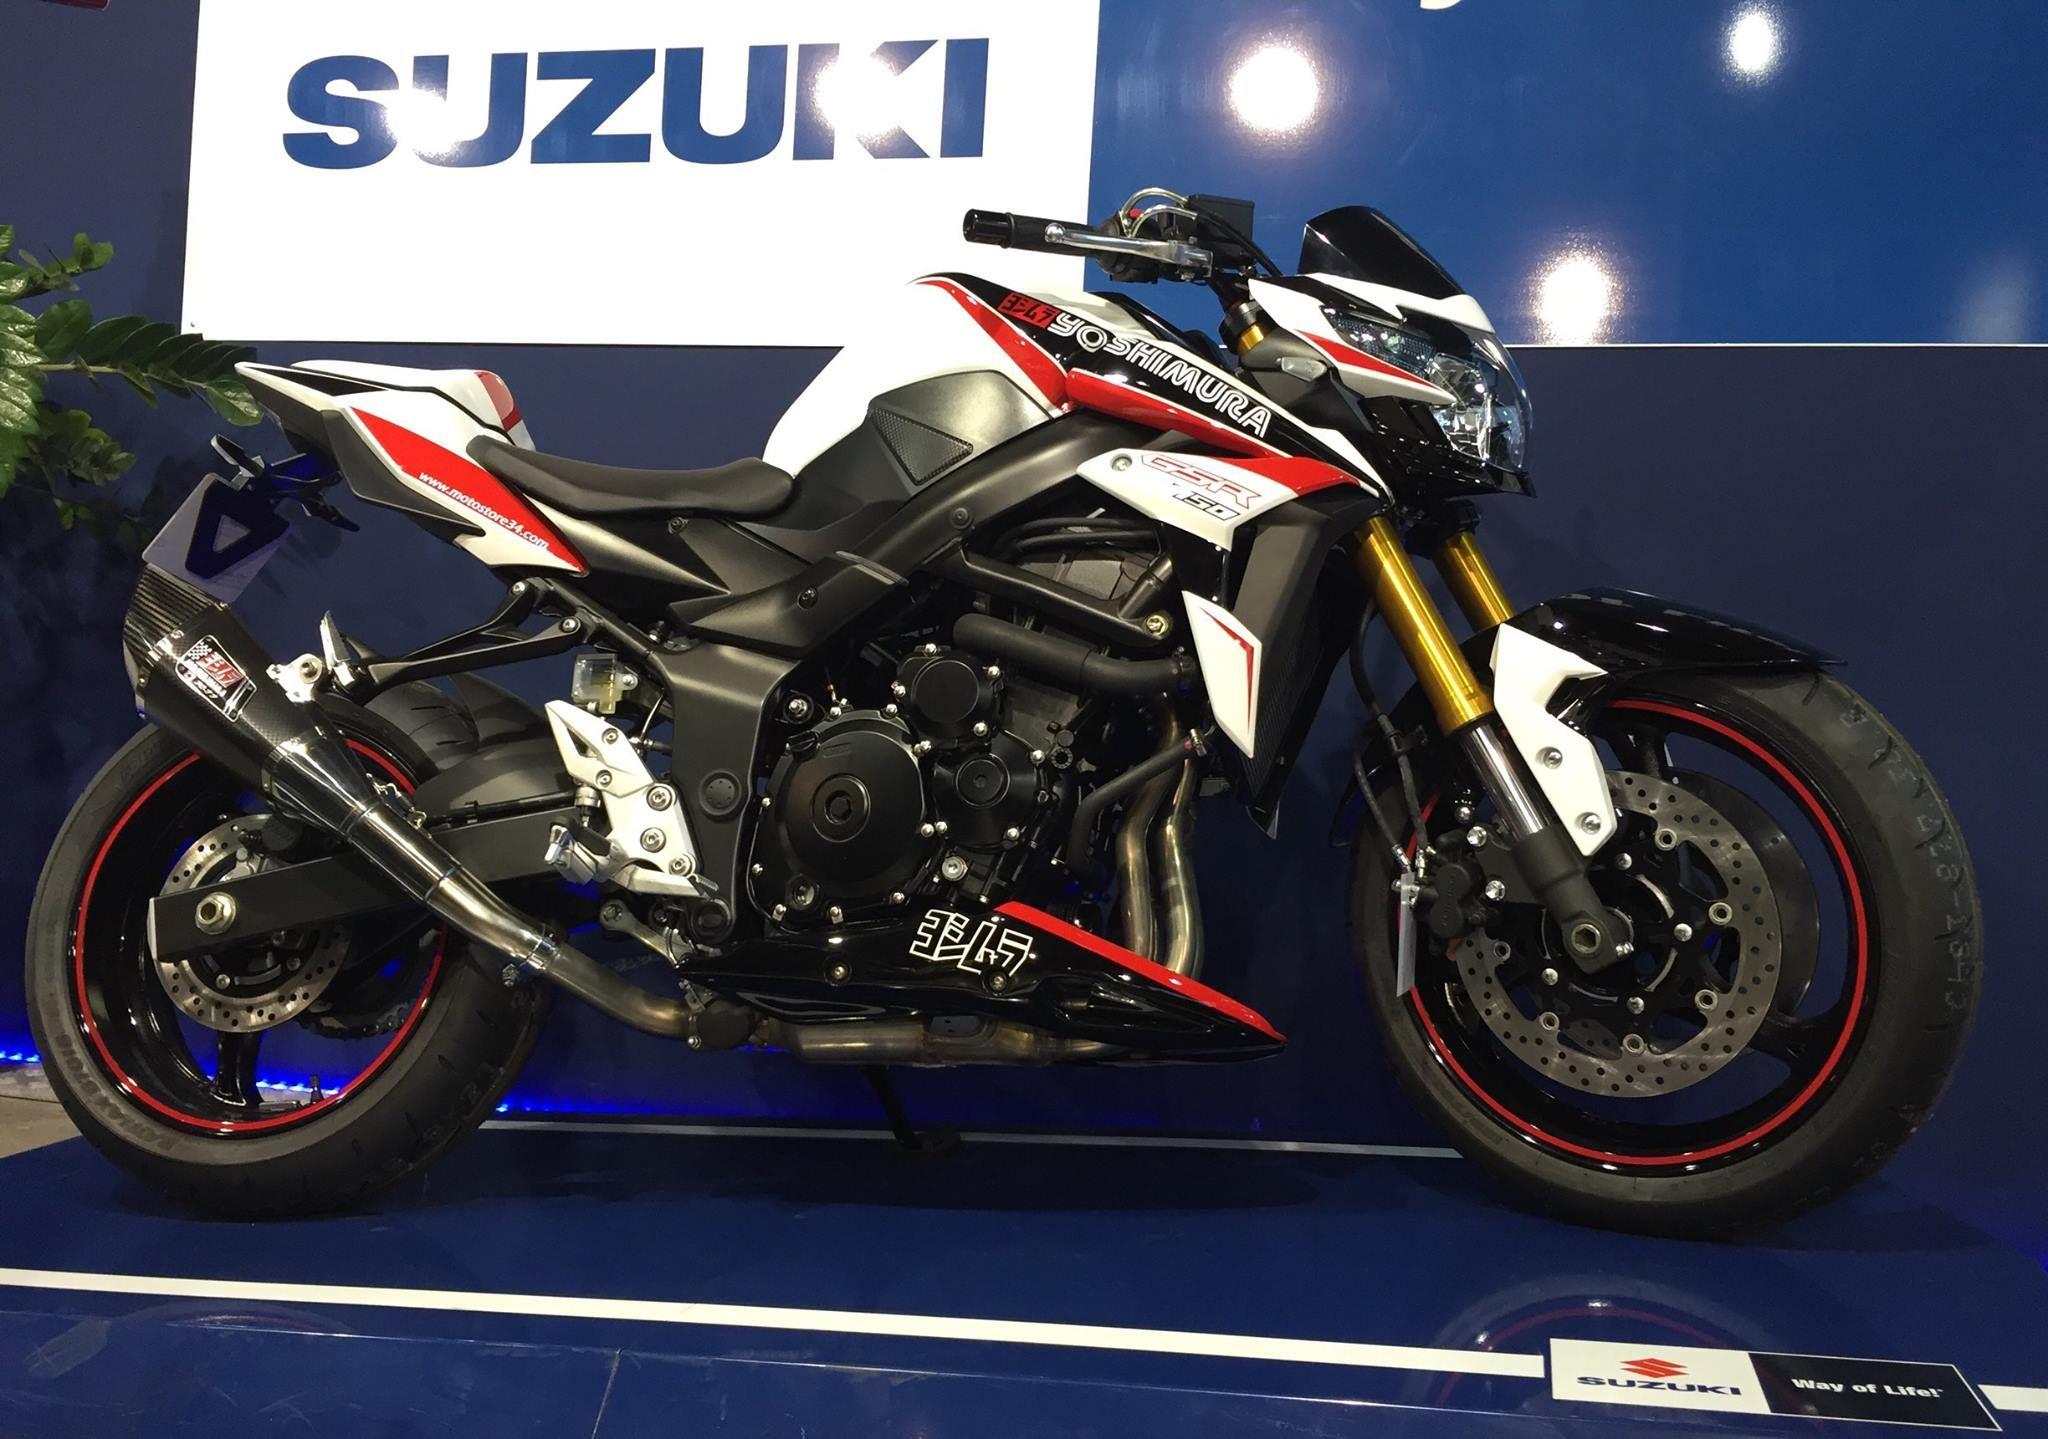 suzuki gsr 750 yoshimura motodream pinterest motos. Black Bedroom Furniture Sets. Home Design Ideas